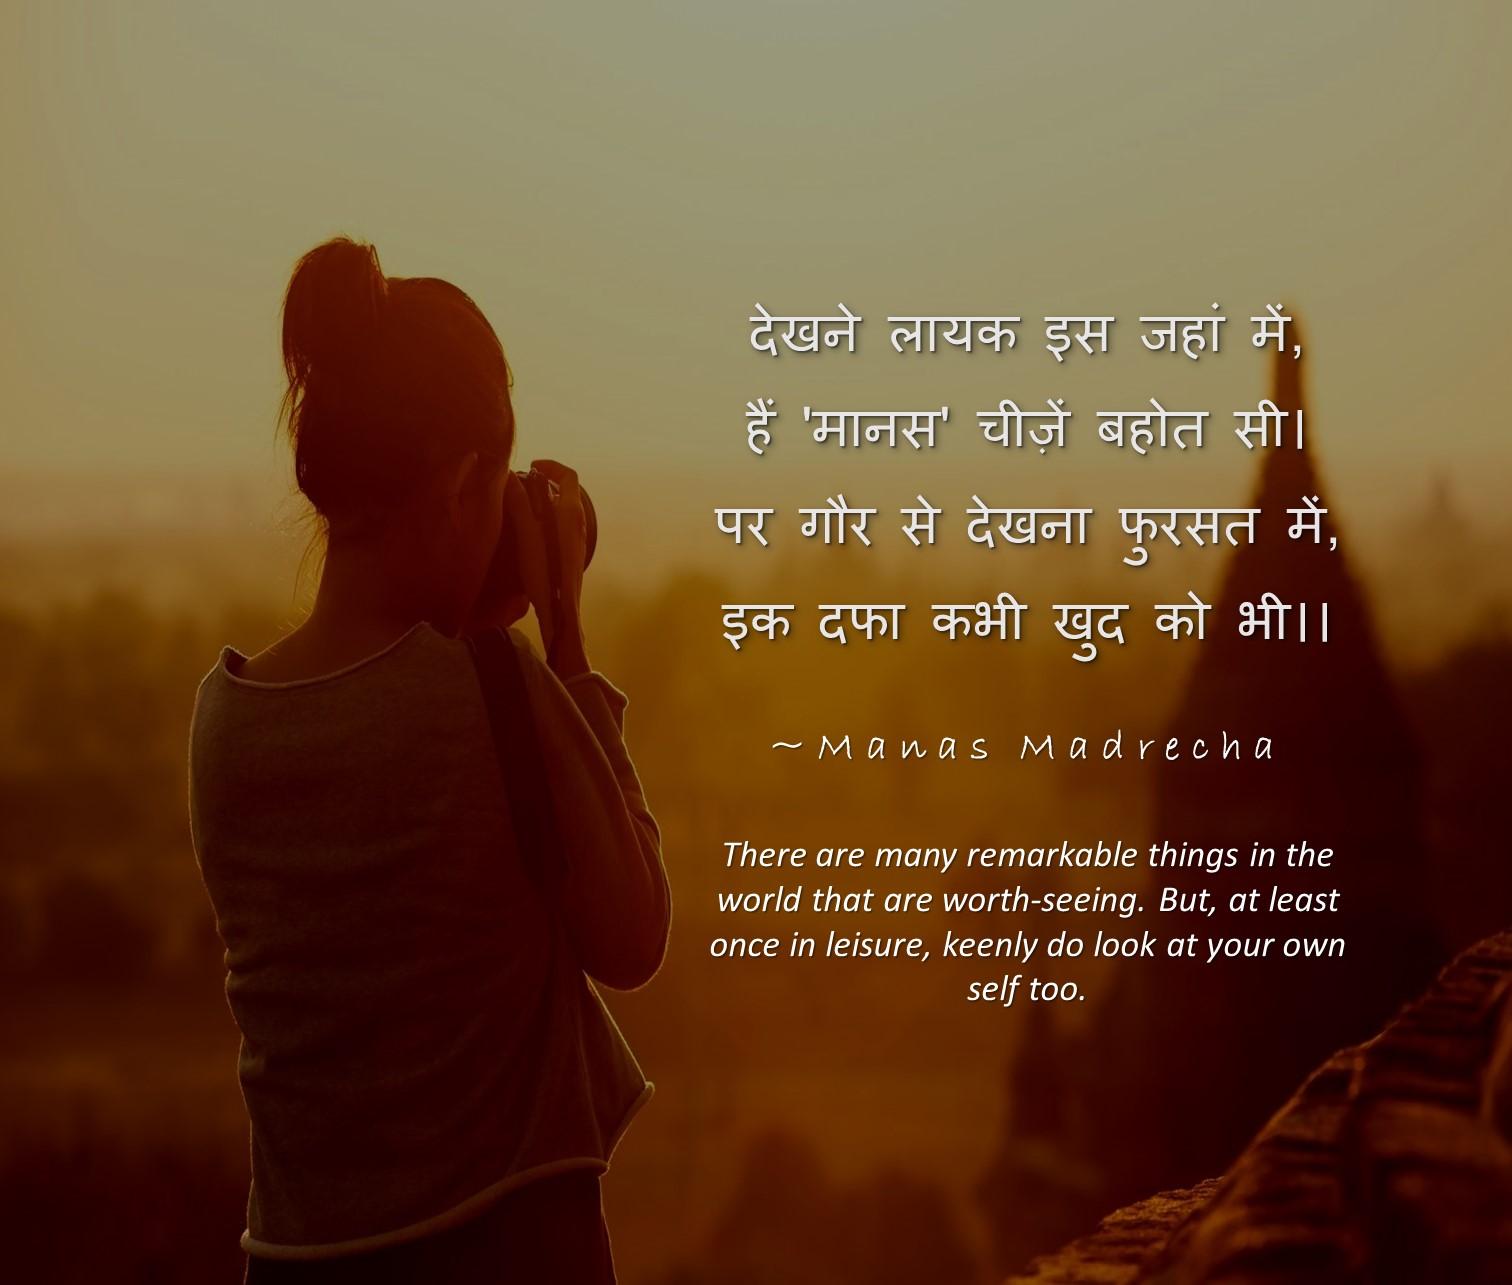 girl clicking pic, girl clicking photo, girl doing photography, girl taking photo tumblr, indian temple sunset, girl facing back, girl mood wallpaper, girl in sunshine, Manas Madrecha, Manas Madrecha blog, simplifying universe, hindi poem on self, hindi quotes, hindi shayari, inspirational poem, inspirational quotes, motivational quotes, first talk about yourself, pehle khud ki baat karo,